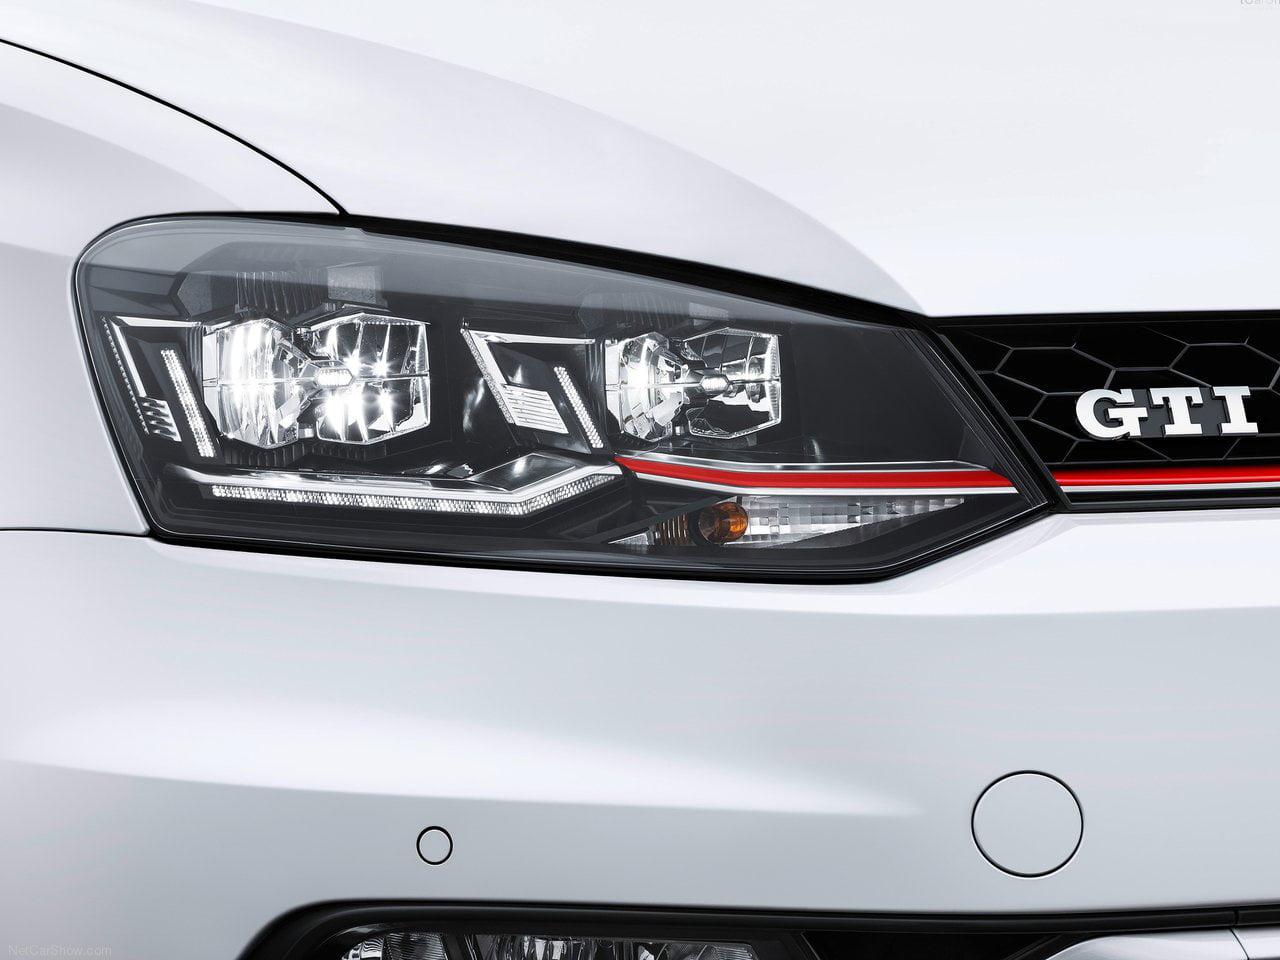 Volkswagen-Polo_GTI_2015_Pics_LED_Headlight - CarBlogIndia